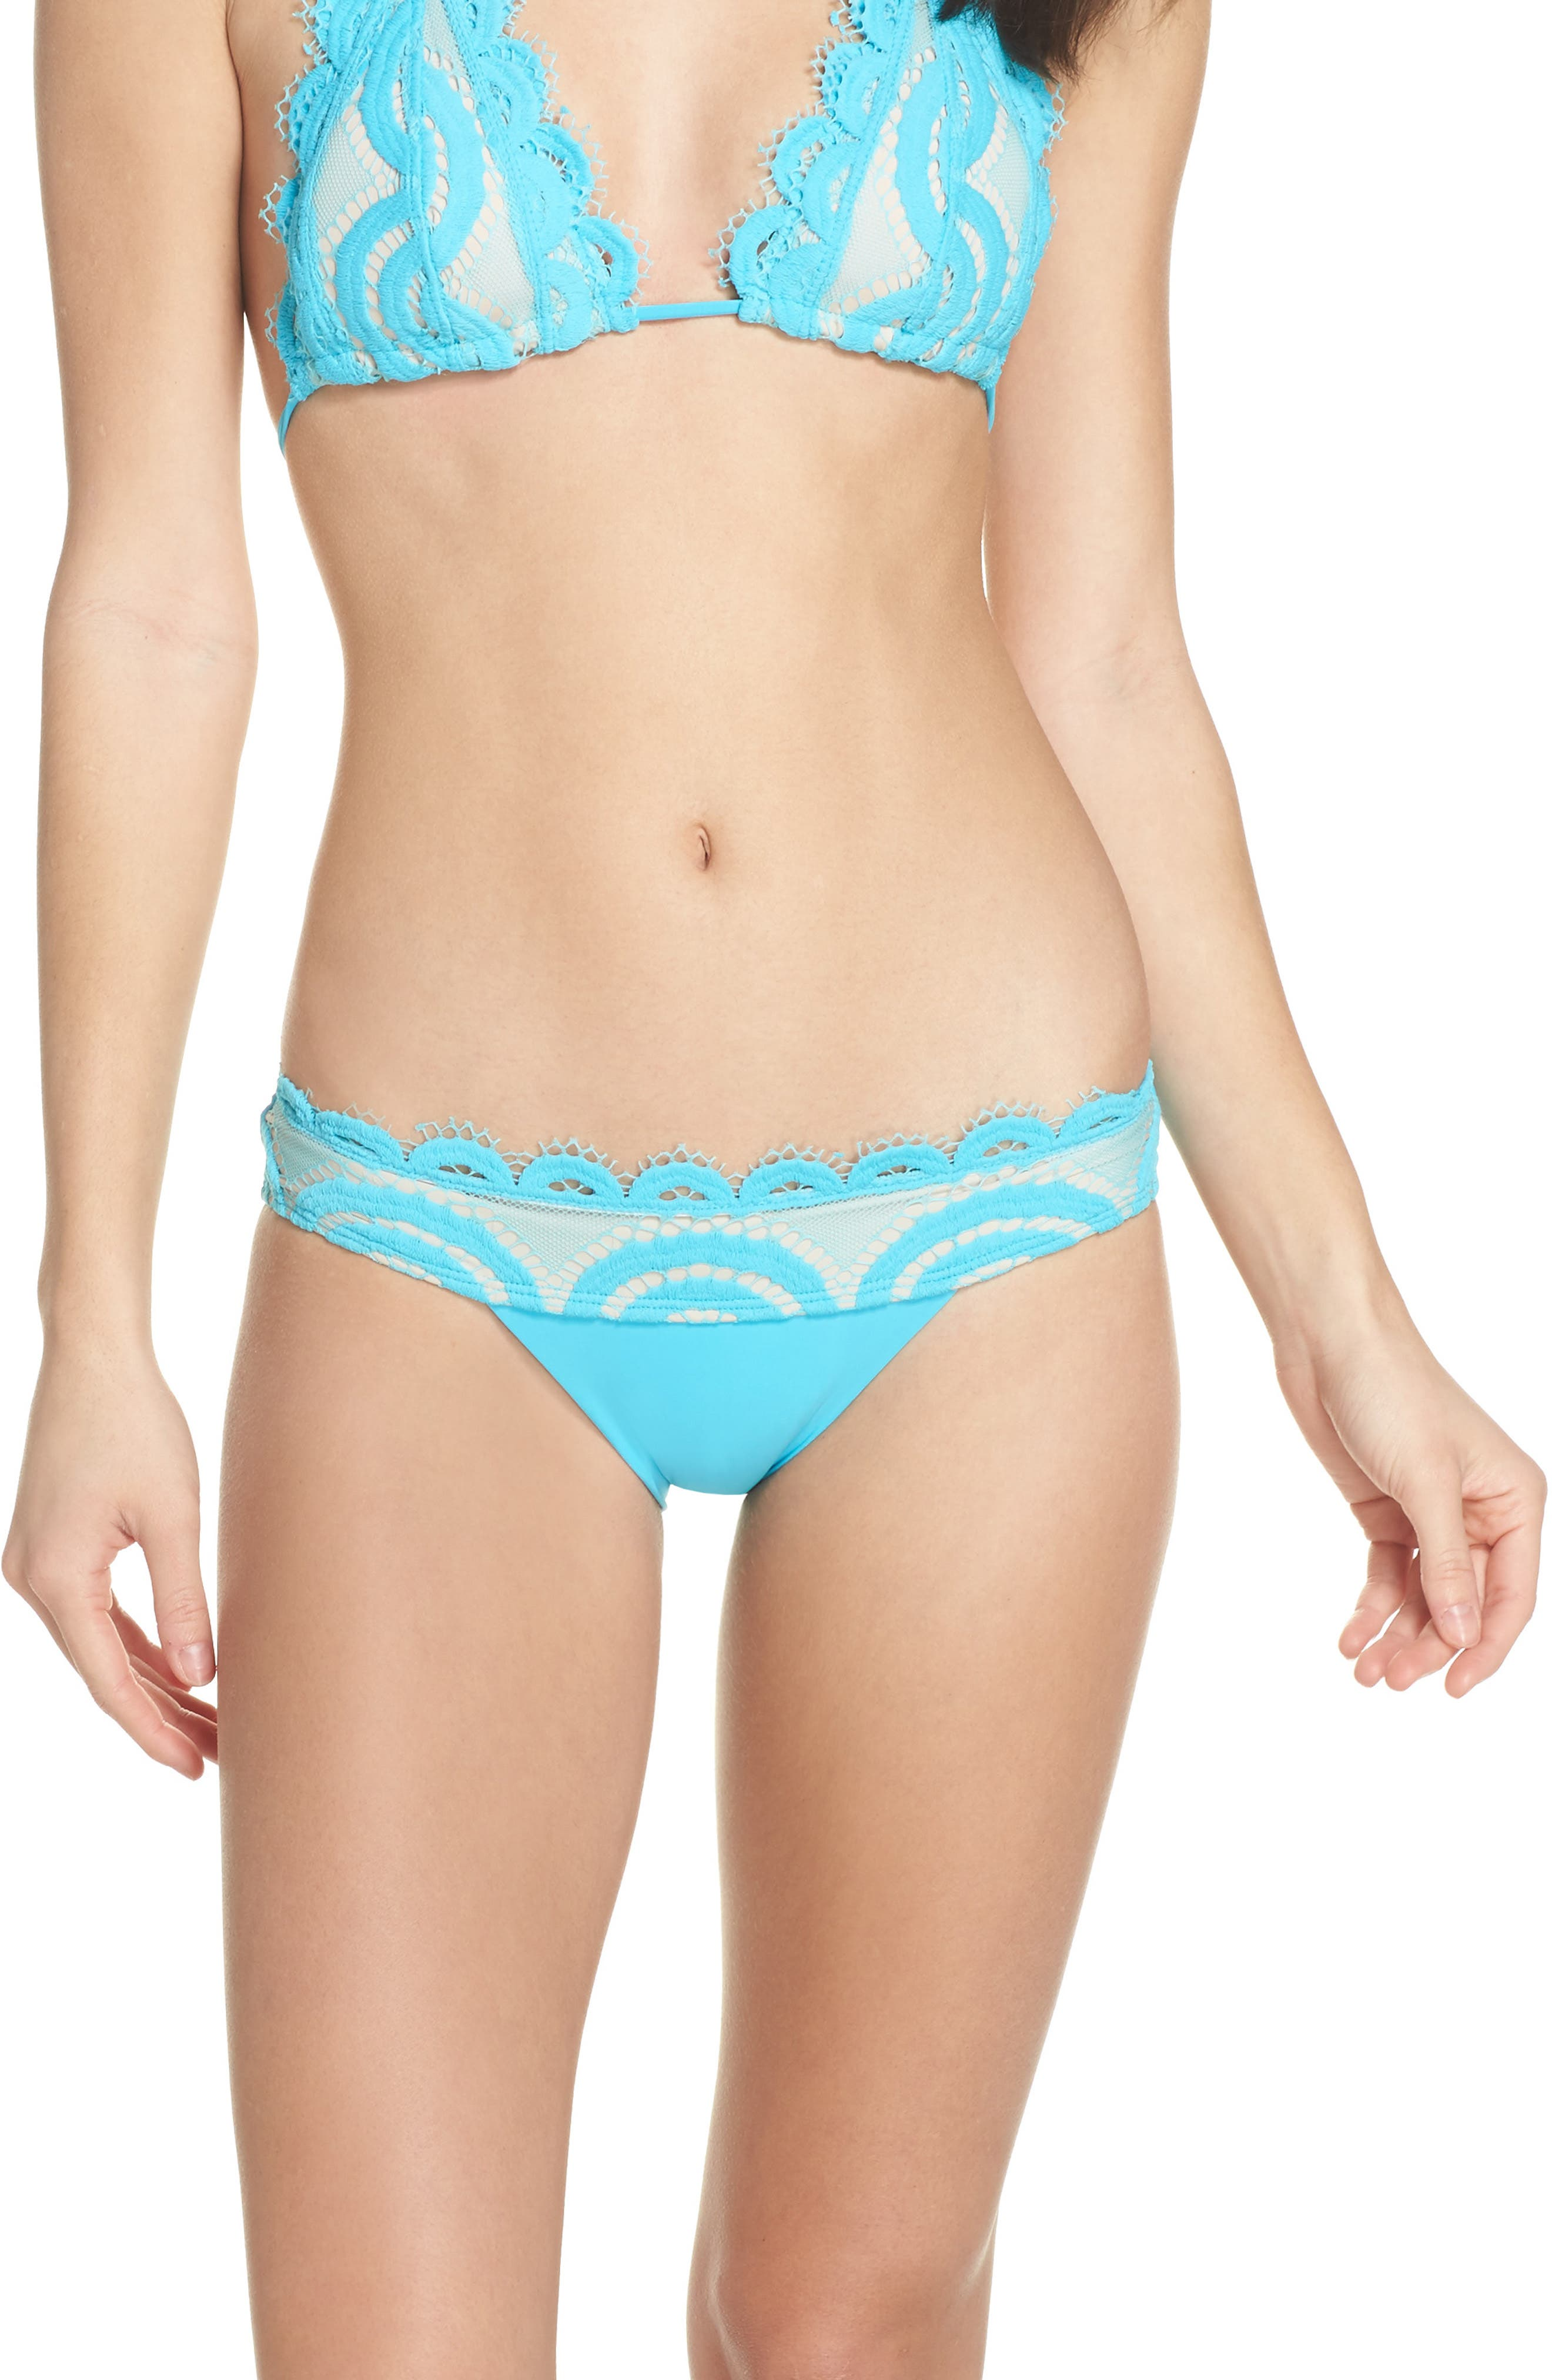 Banded Lace Bikini Bottoms,                         Main,                         color, Marine